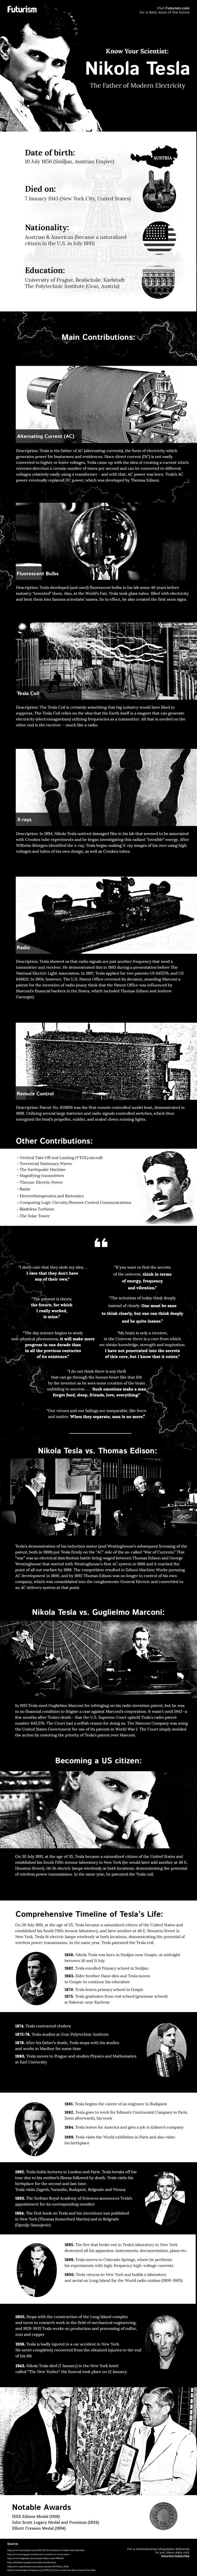 Nikola Tesla what an absolute ledge... Pure genius.